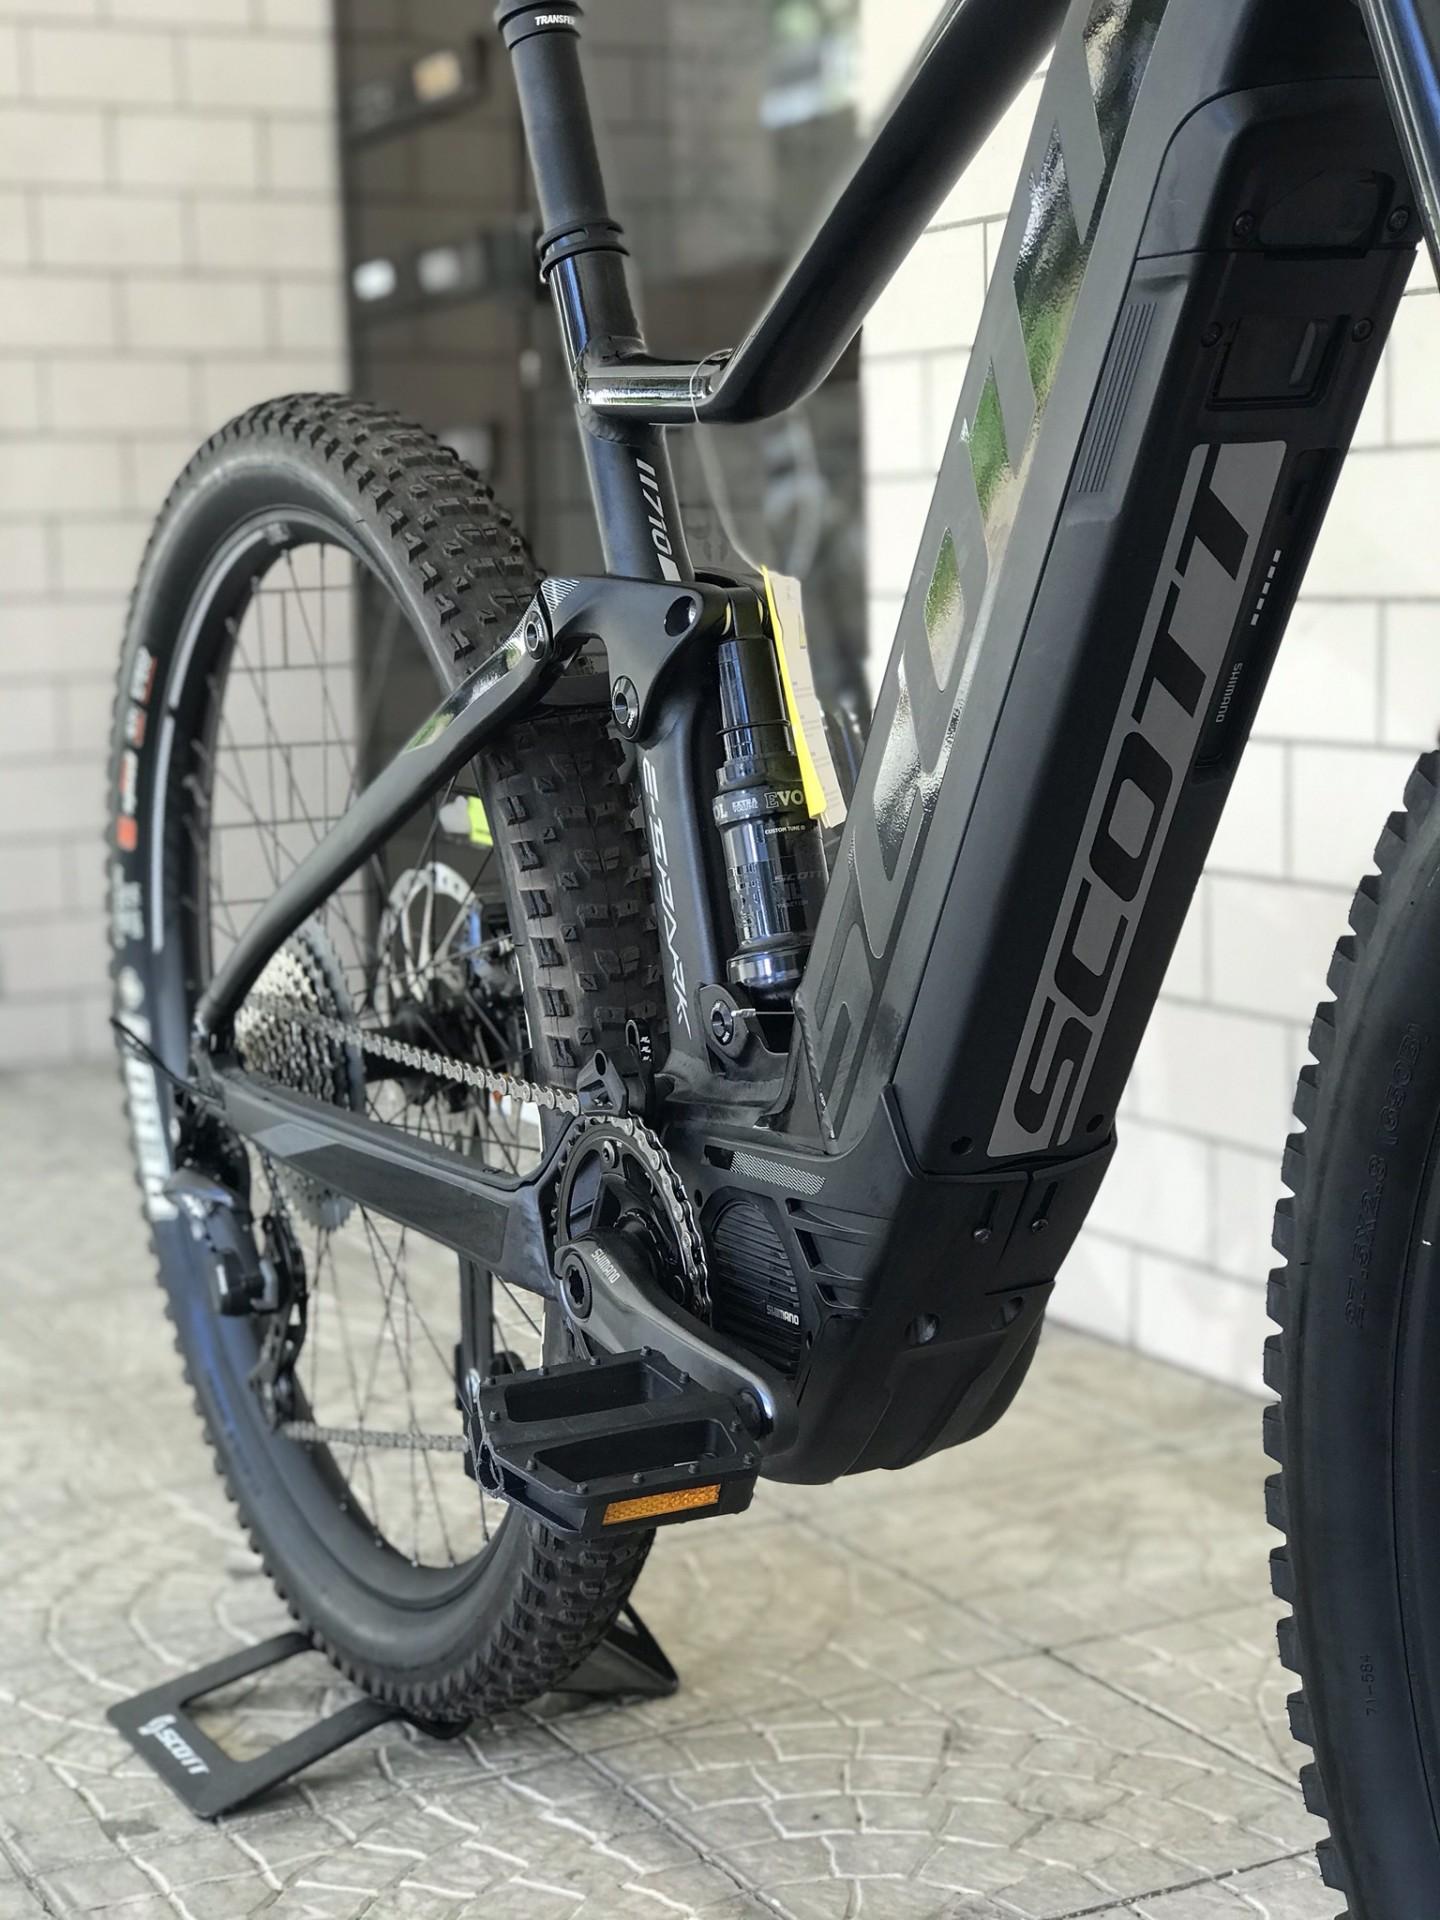 BICICLETA SCOTT E-SPARK 710 - 2018